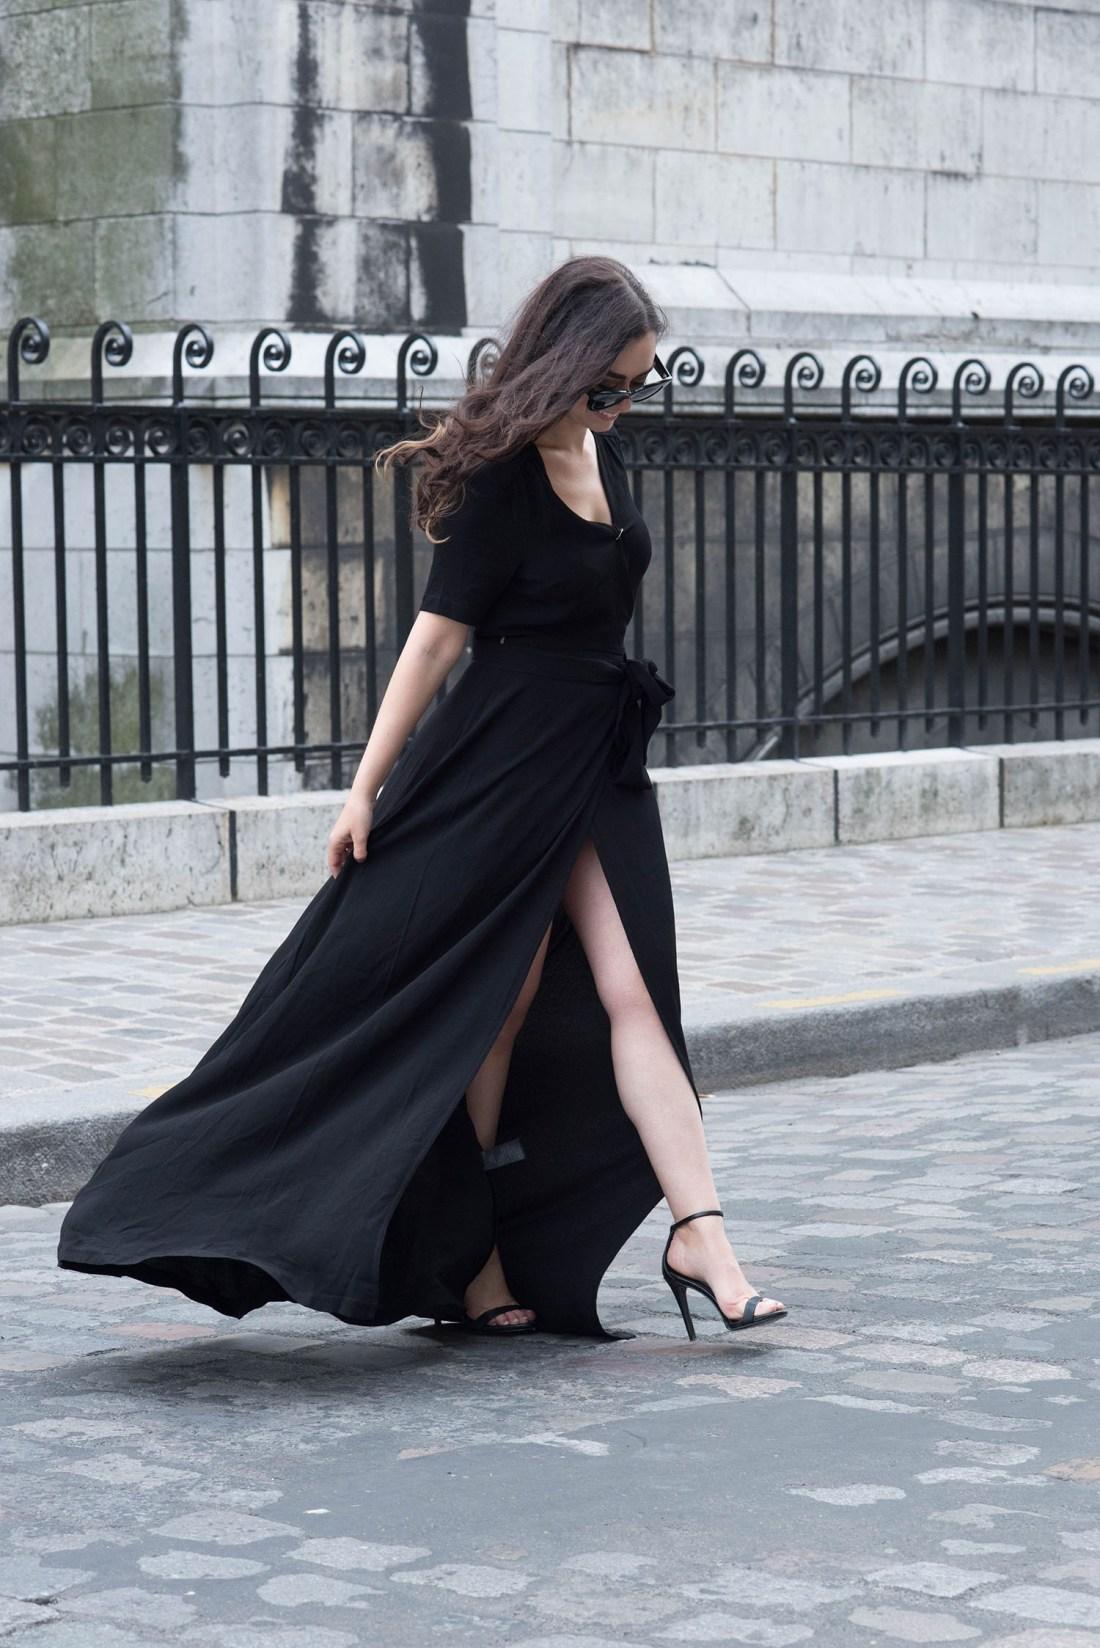 Fashion blogger Cee Fardoe of Coco & Vera walks in Montmartre wearing an Ivy & Oak black wrap dress and Steve Madden Stecy sandals